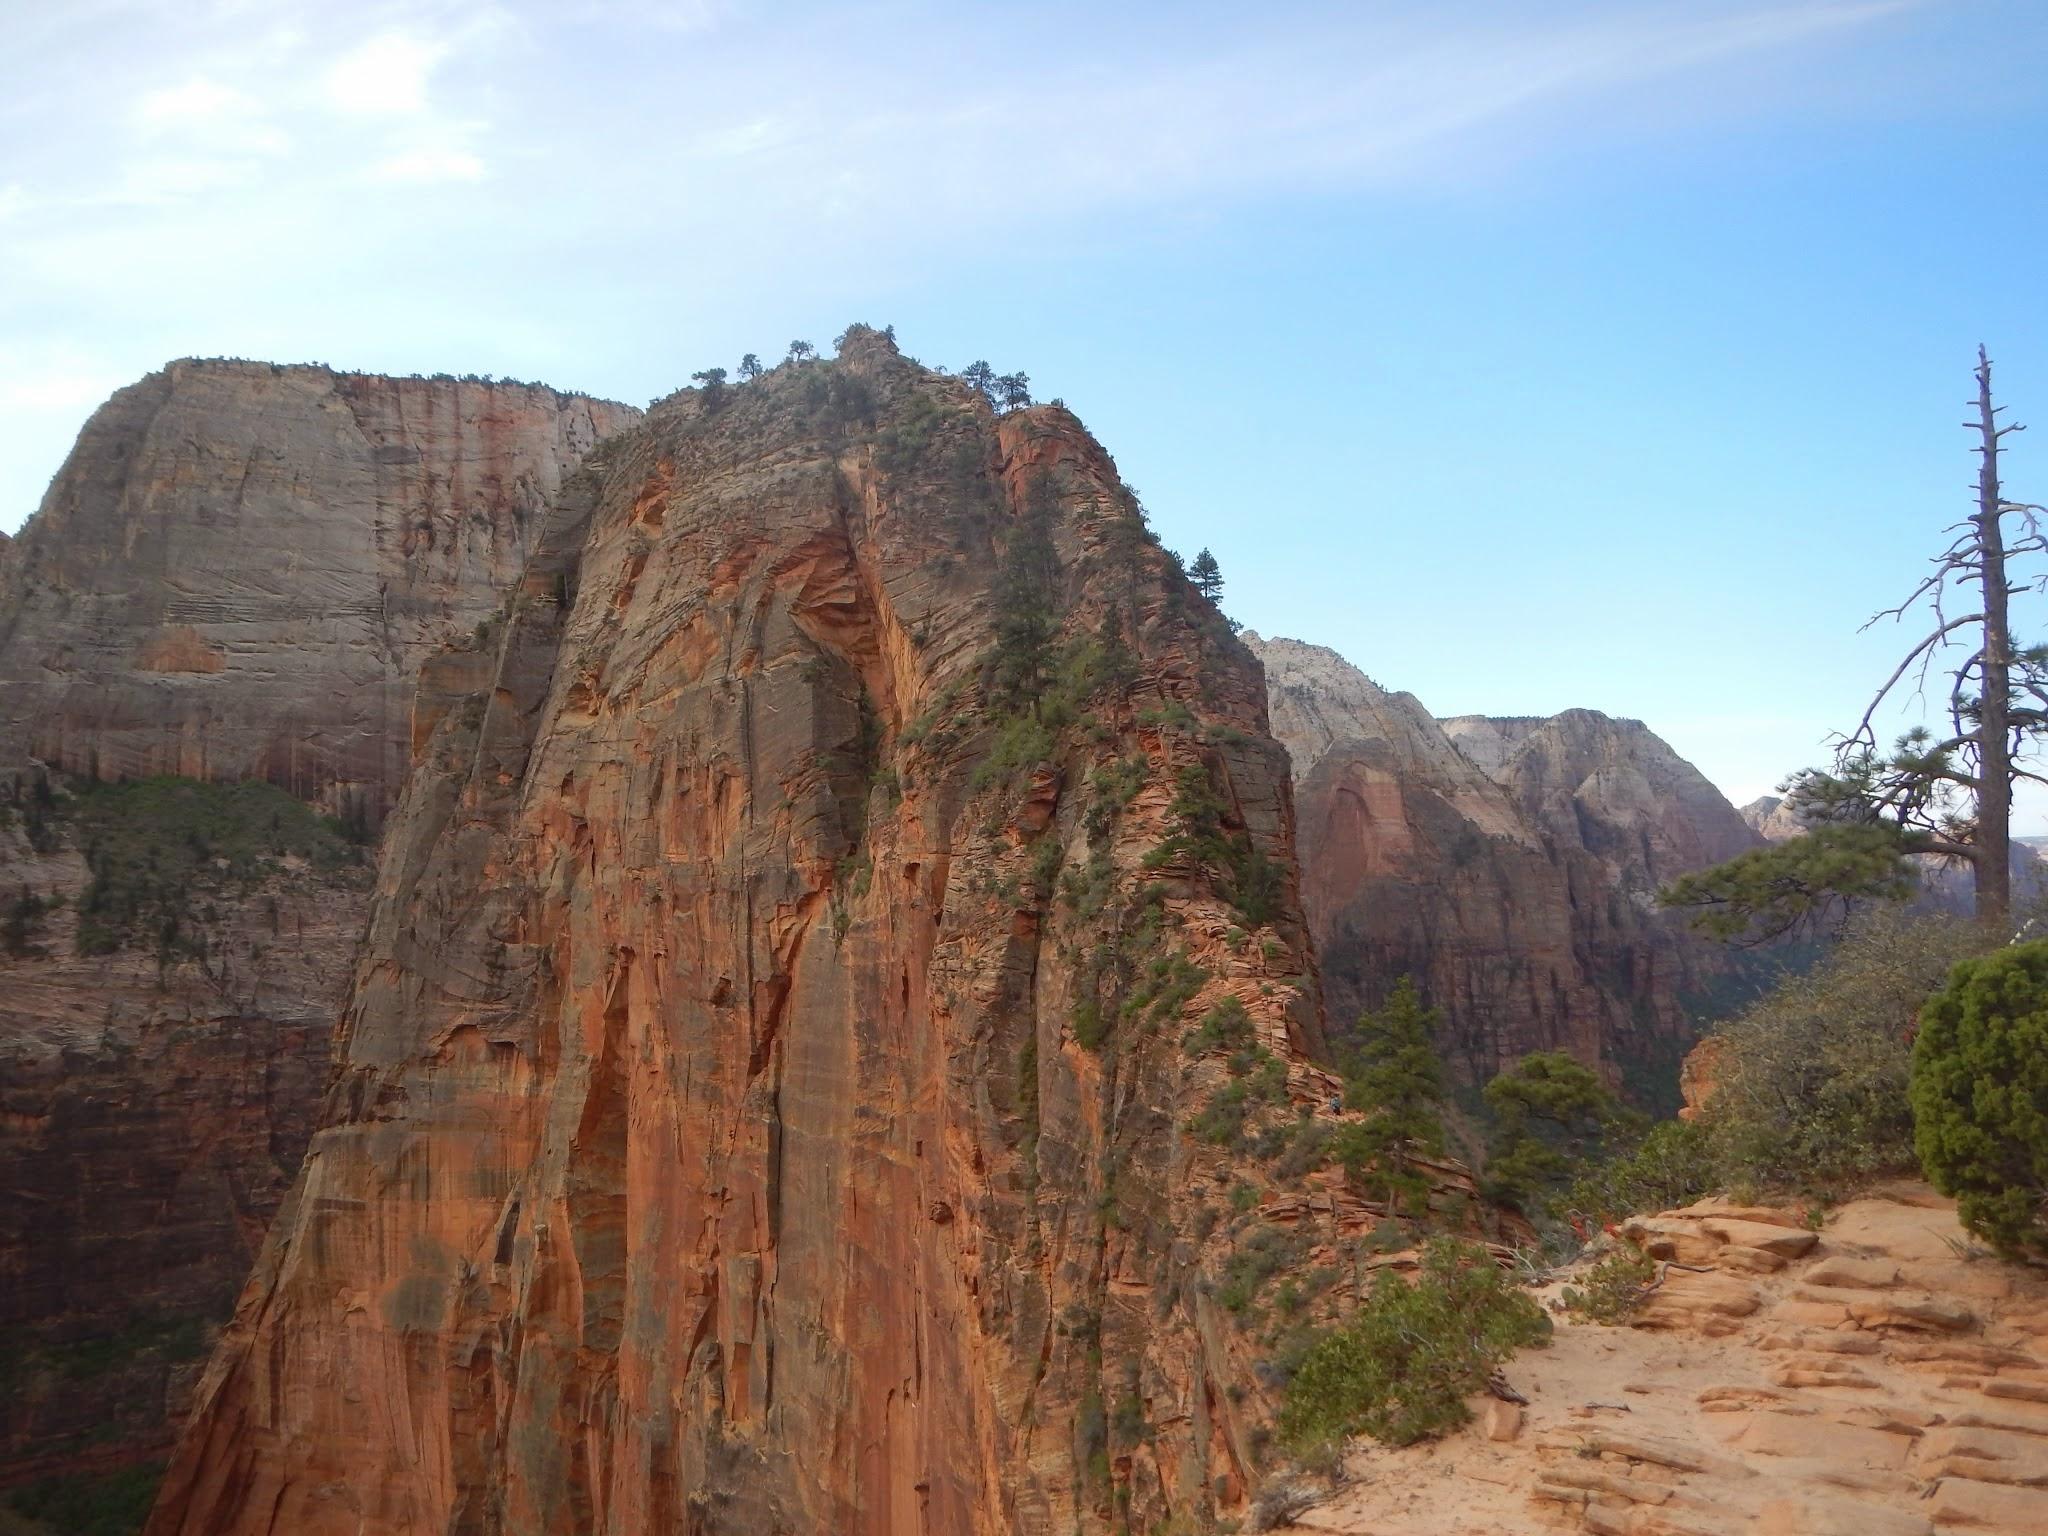 Photo: Look ahead at the narrow rib leading to Angel's Landing